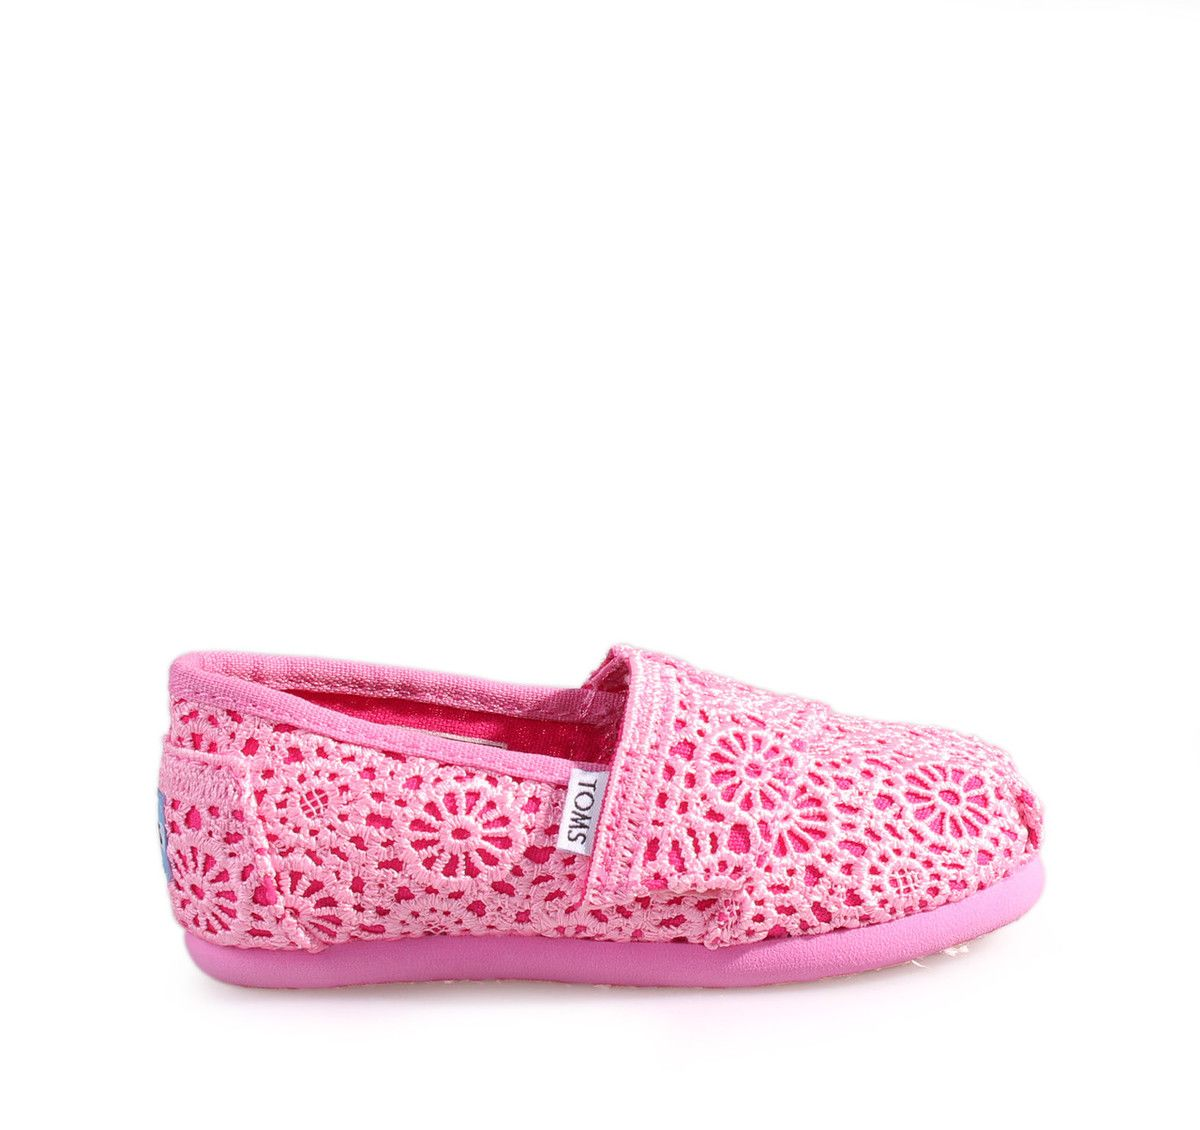 TOMS Pink Espadrilles for Girls. Παιδικές κοριτσίστικες ροζ εσπαντρίγιες. 005e8c414ad